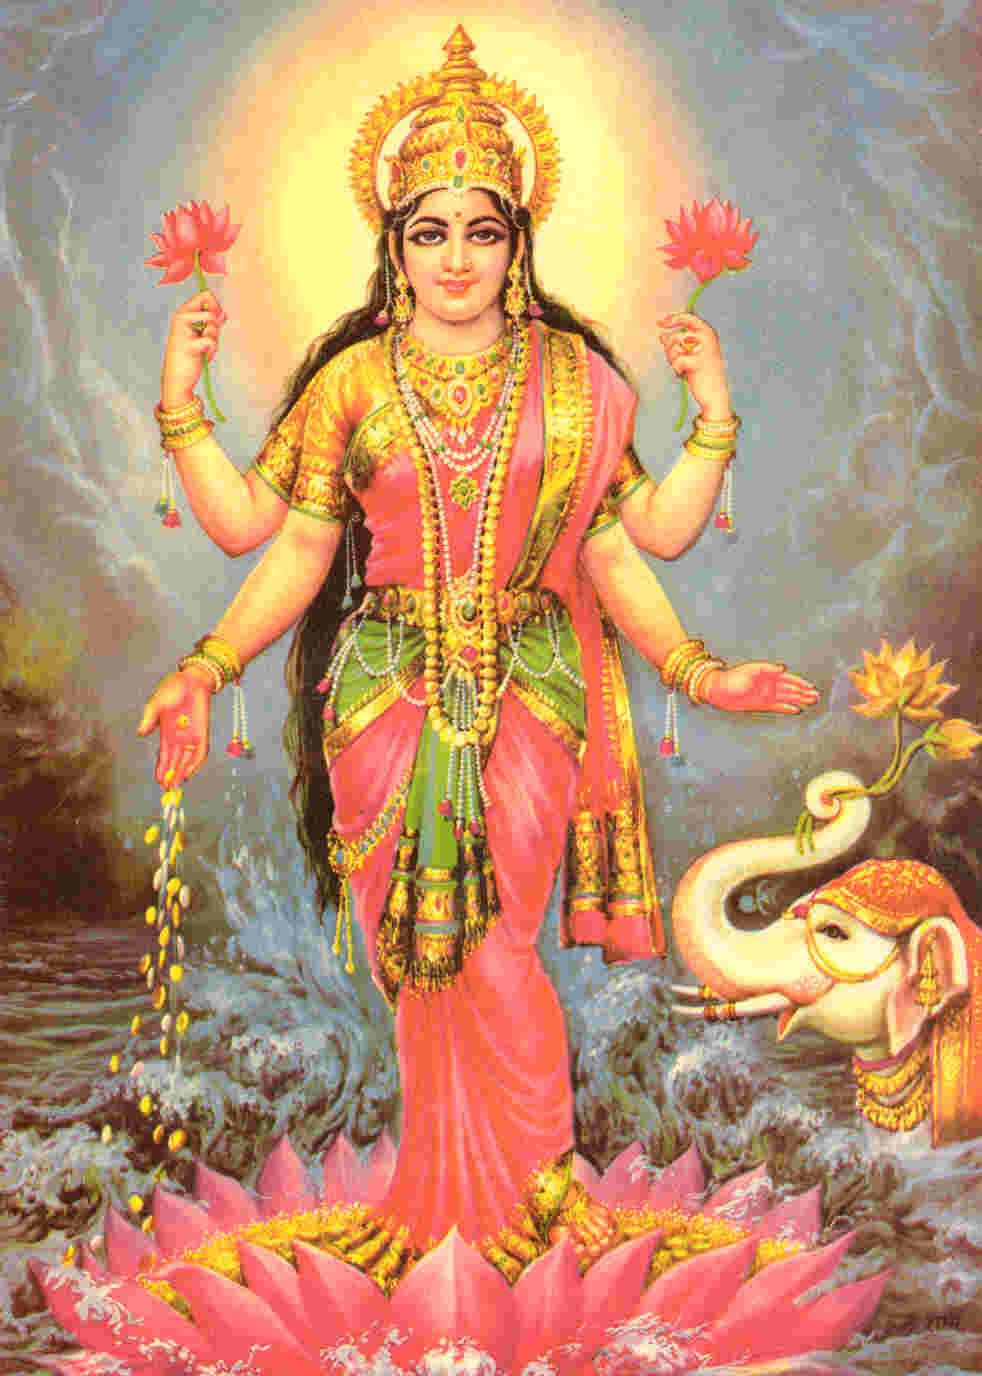 Lakshmi print 2 - Images of hindu gods and goddesses ...